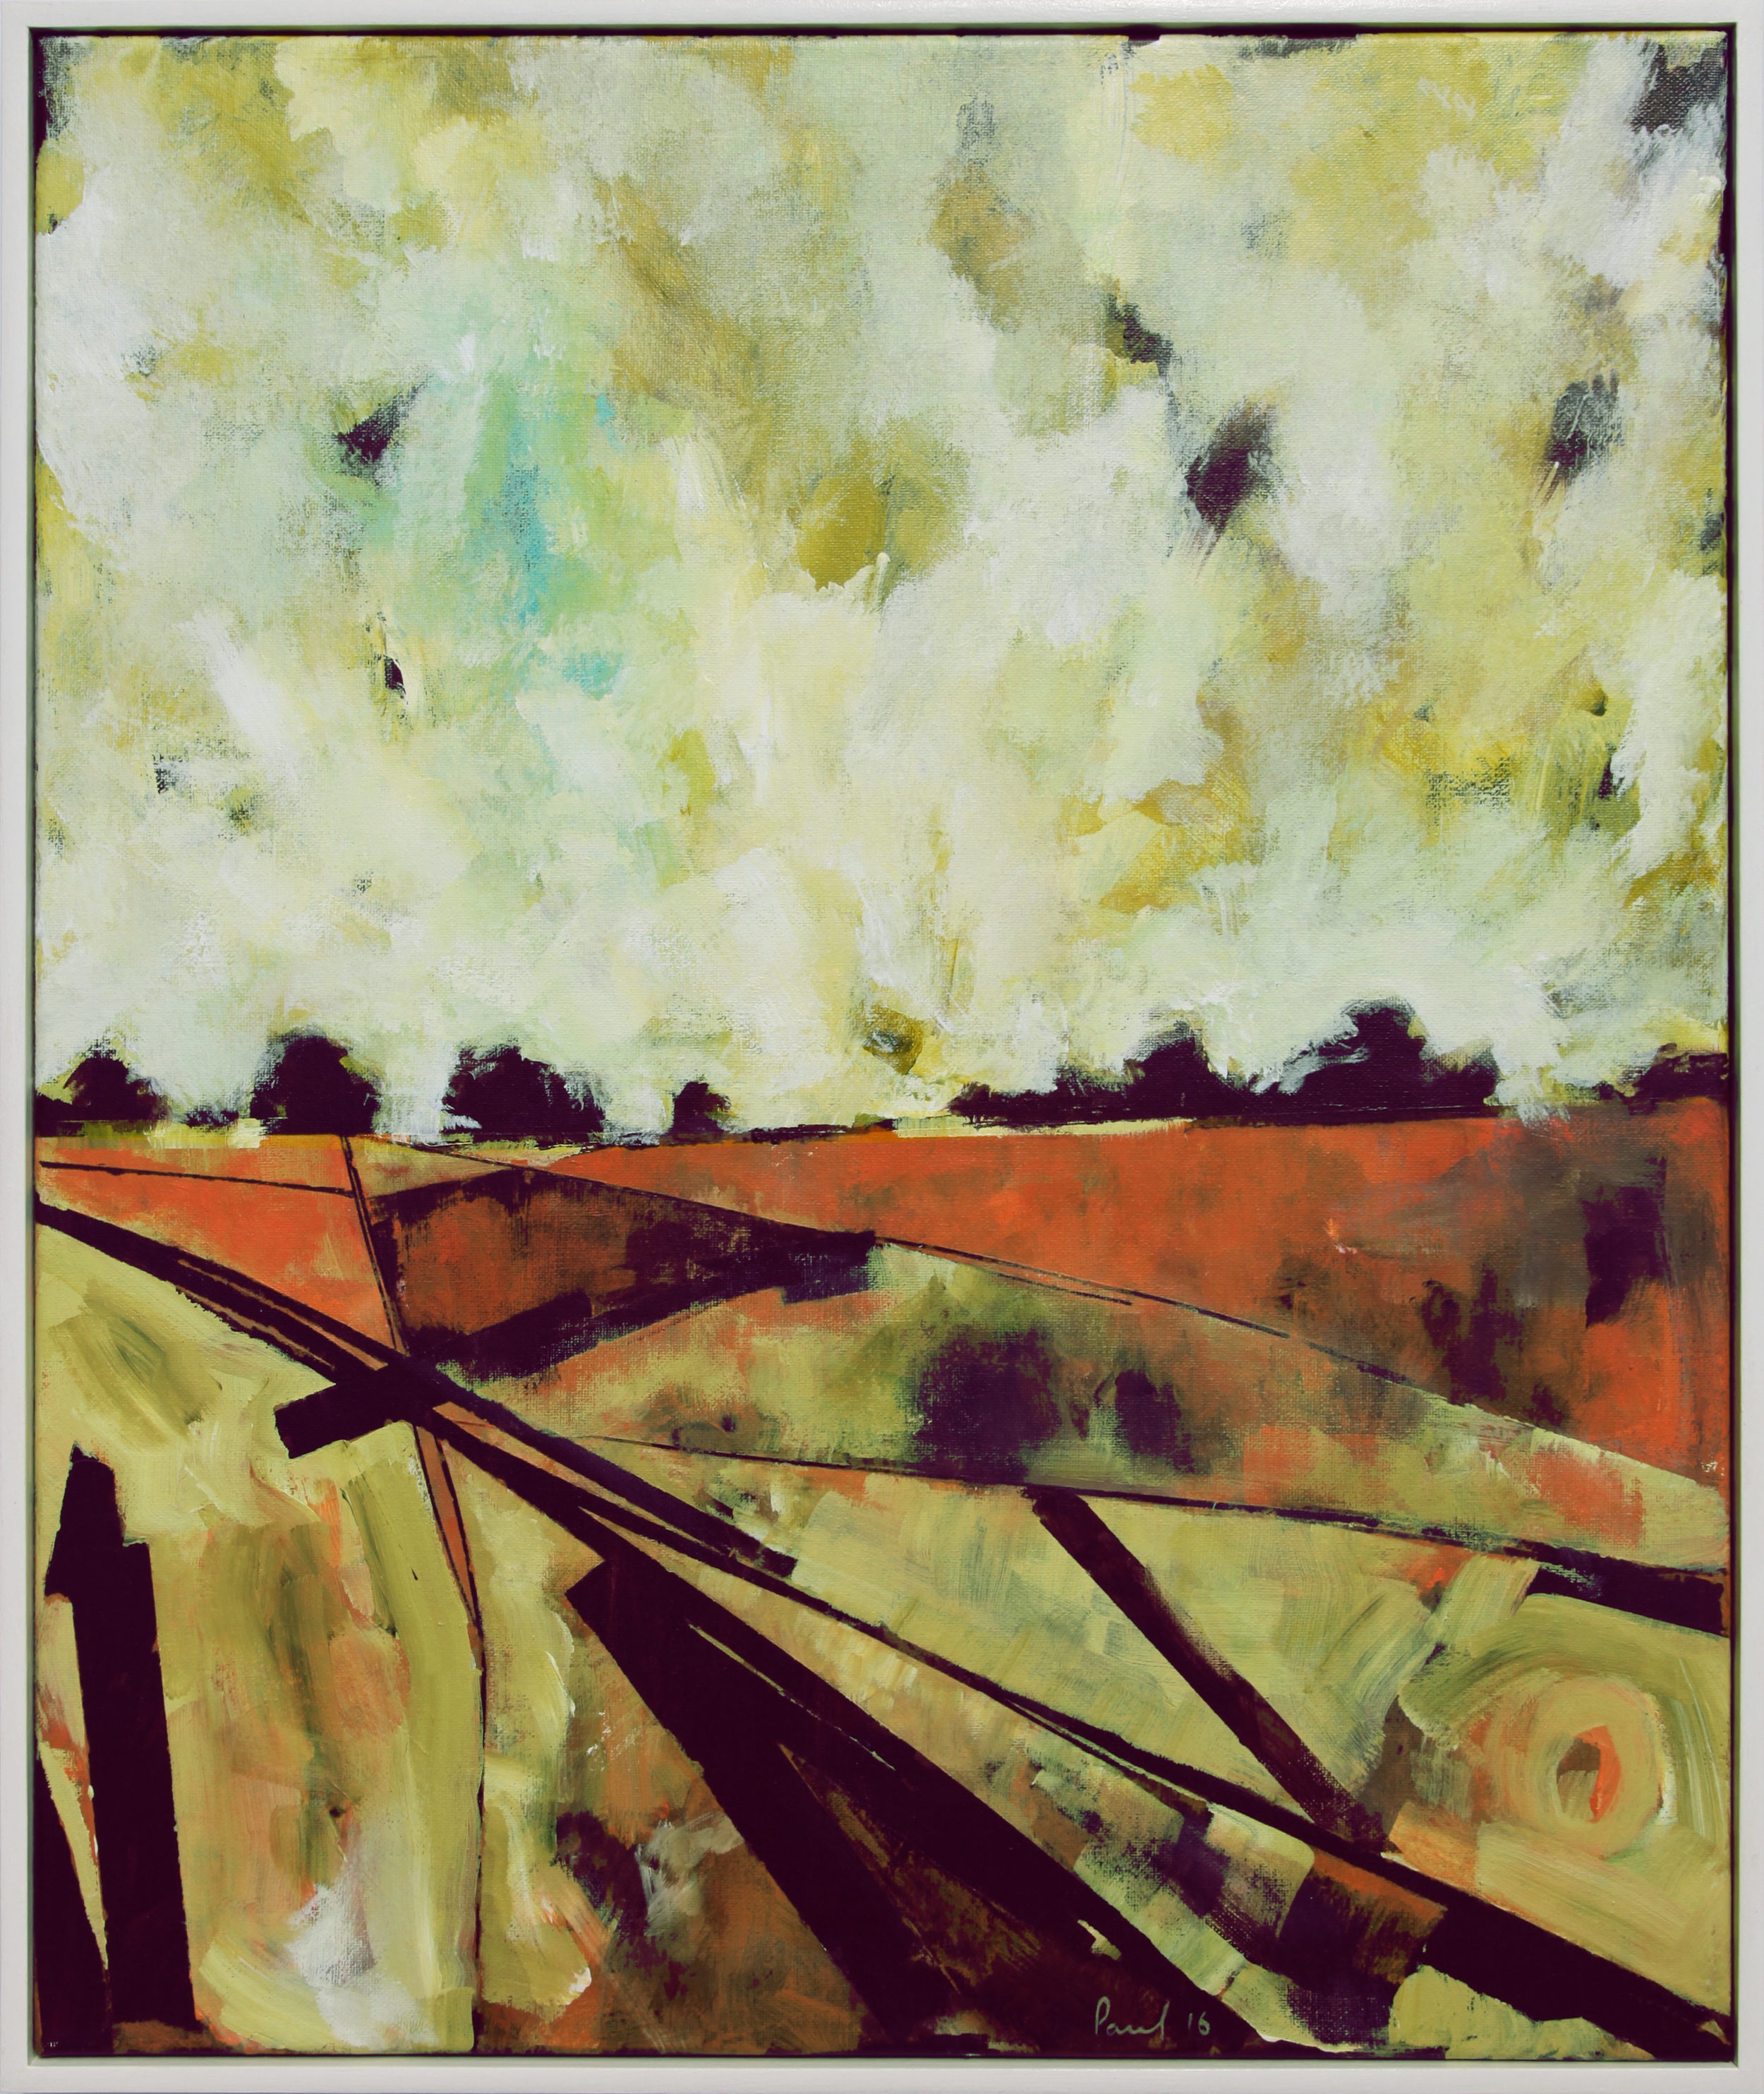 Paul West - Tracks2-LF-16.jpg